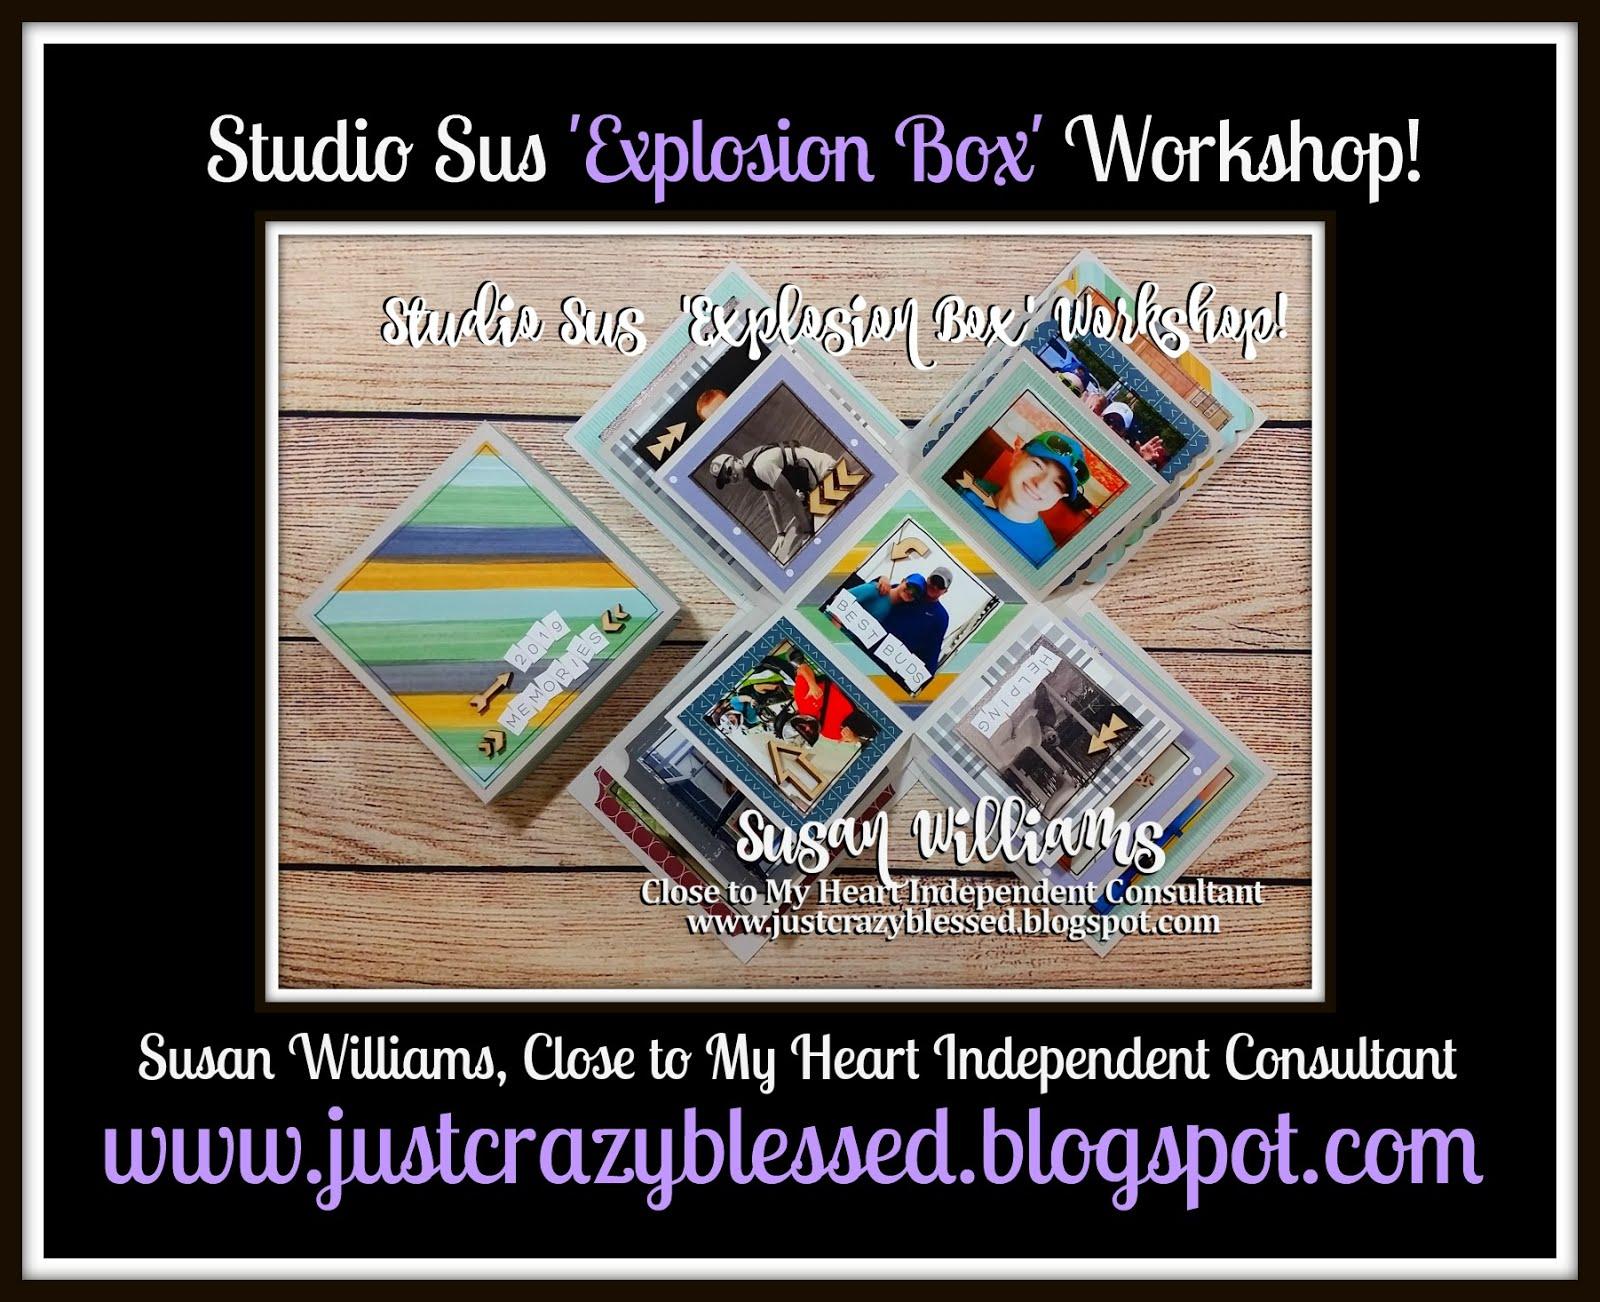 Explosion Box (29) Photo Workshop!